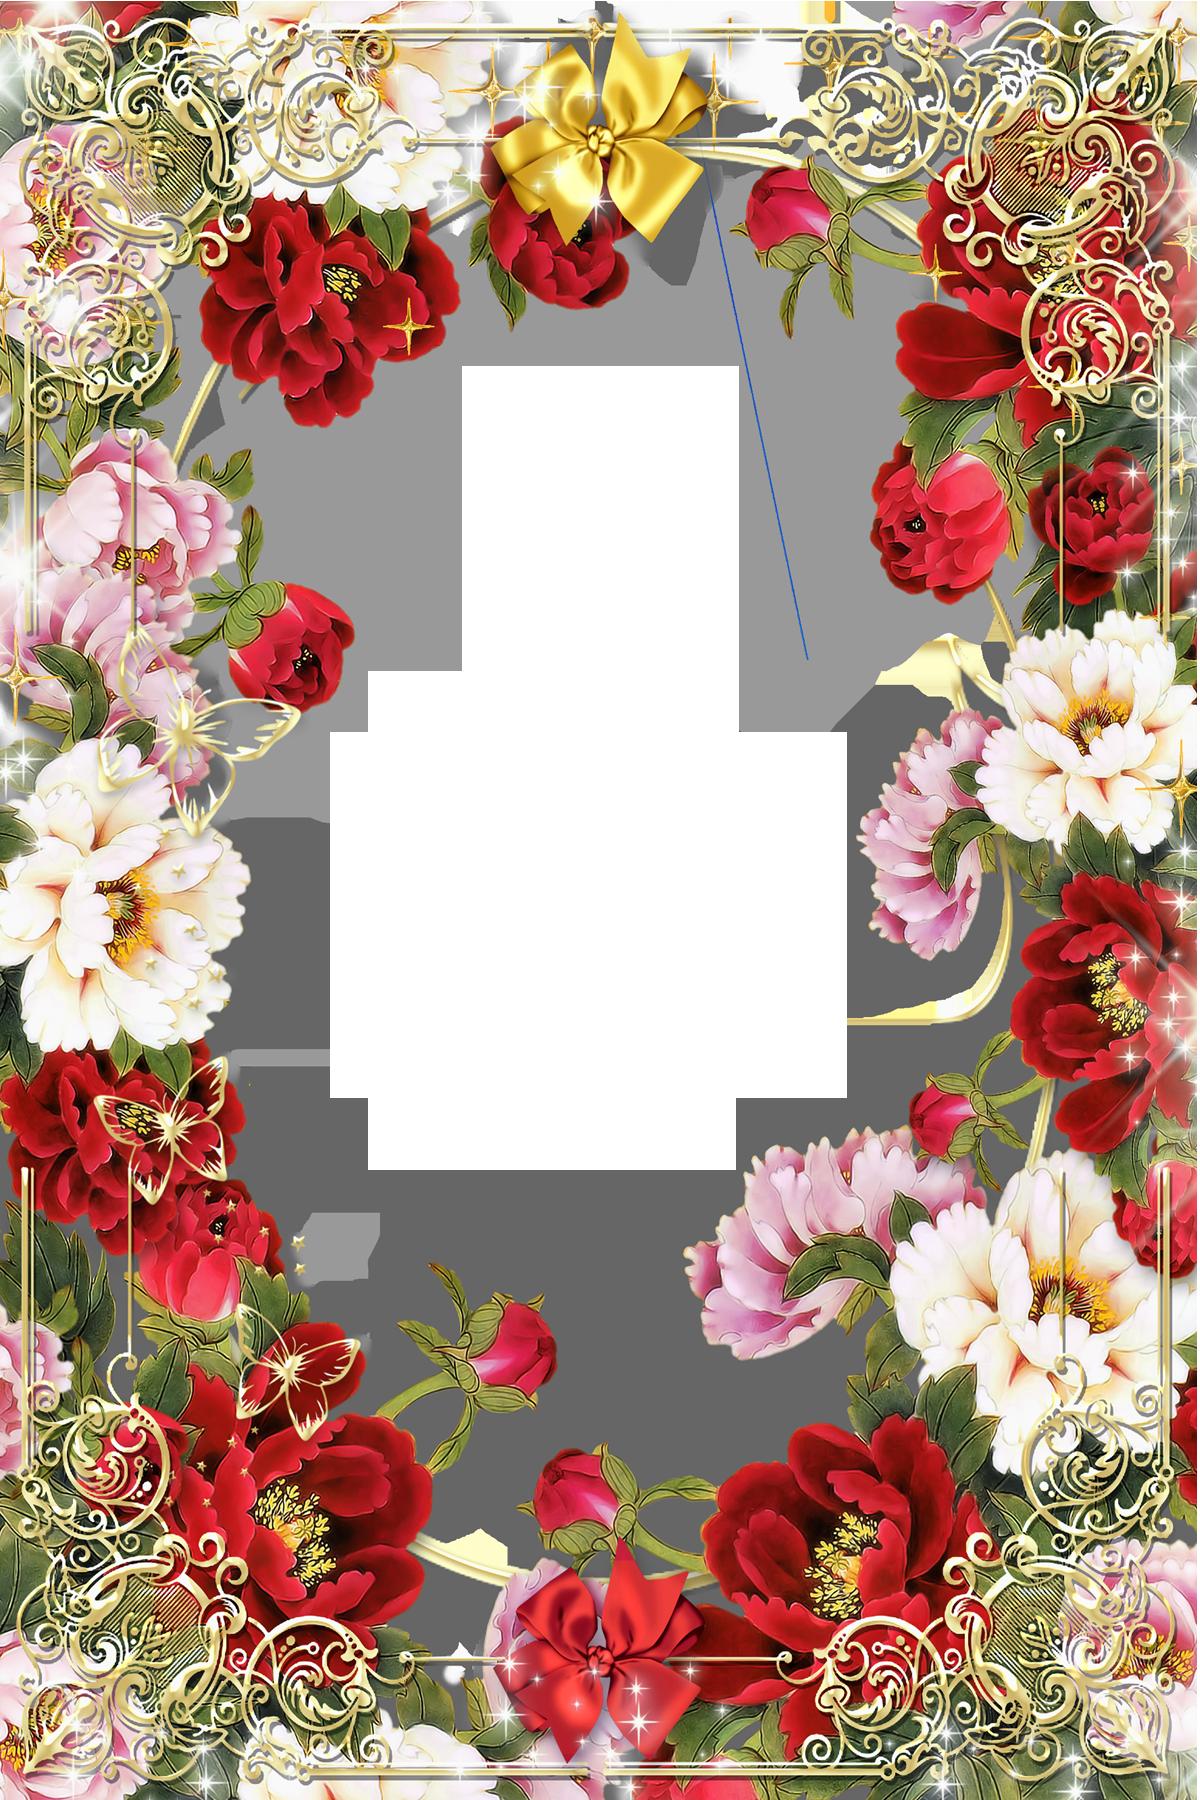 Transparent Gold PNG Frame with Flowers Flower frame